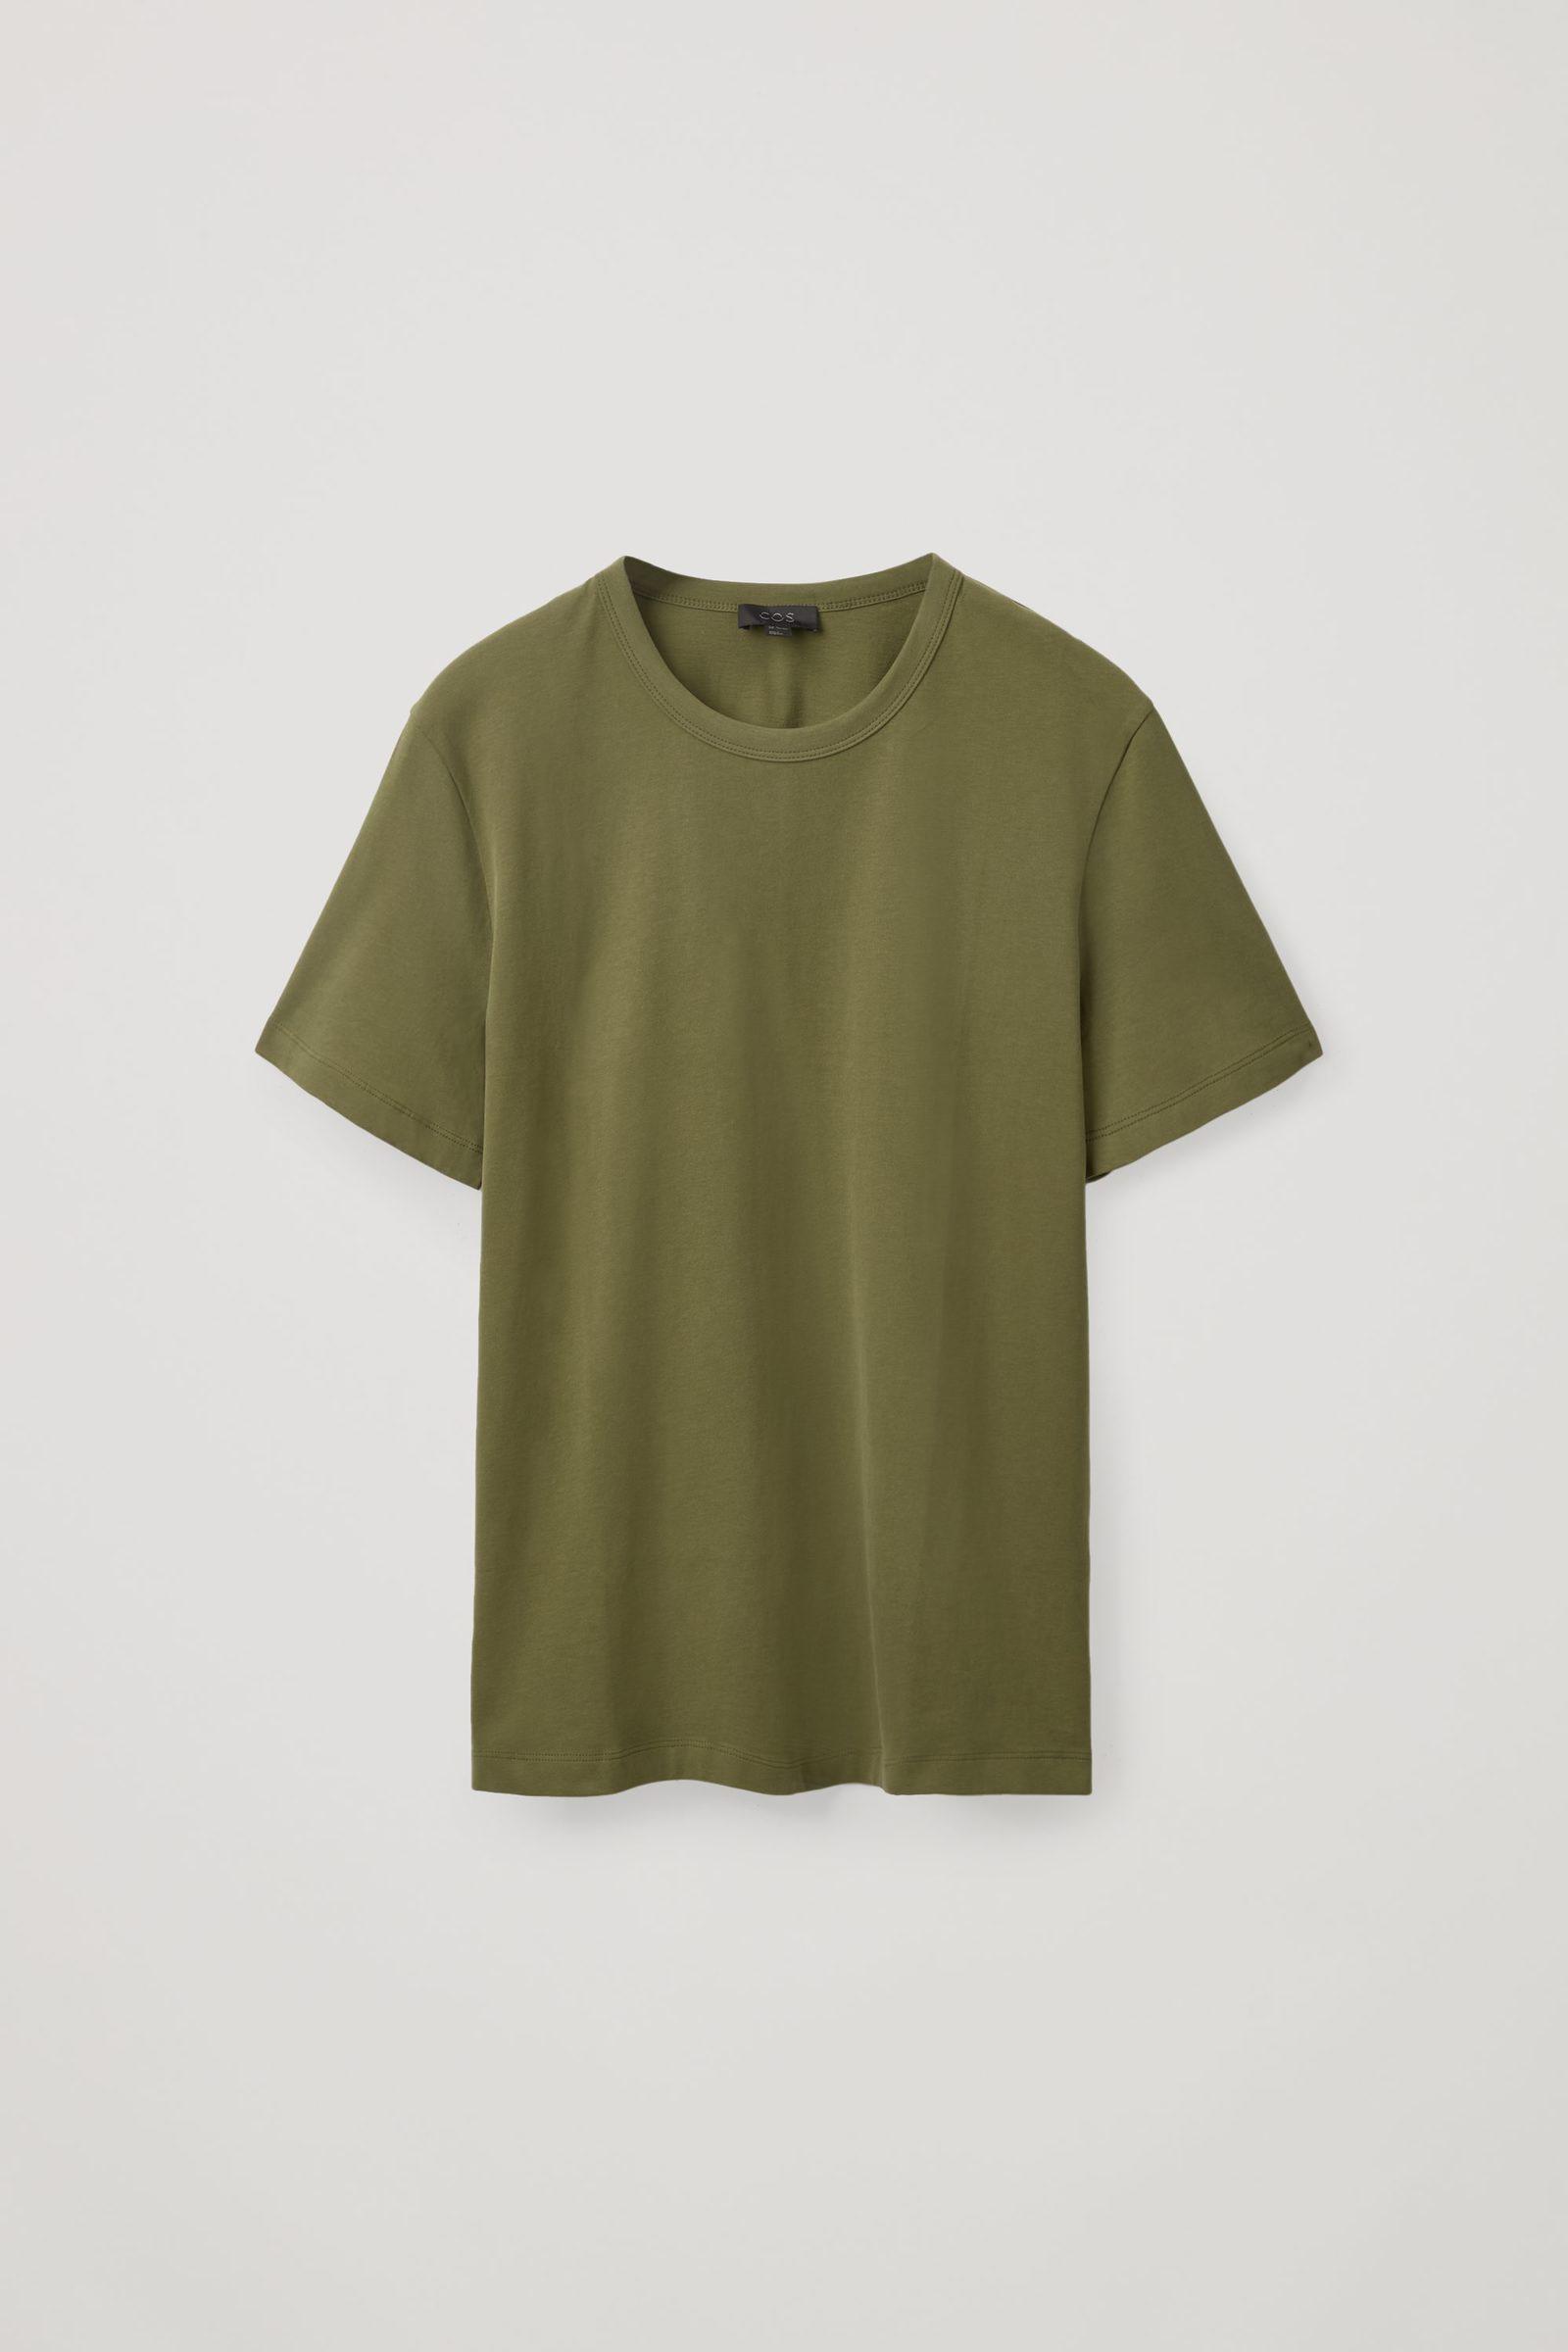 COS 레귤러핏 브러쉬드 코튼 티셔츠의 카키 그린컬러 Product입니다.